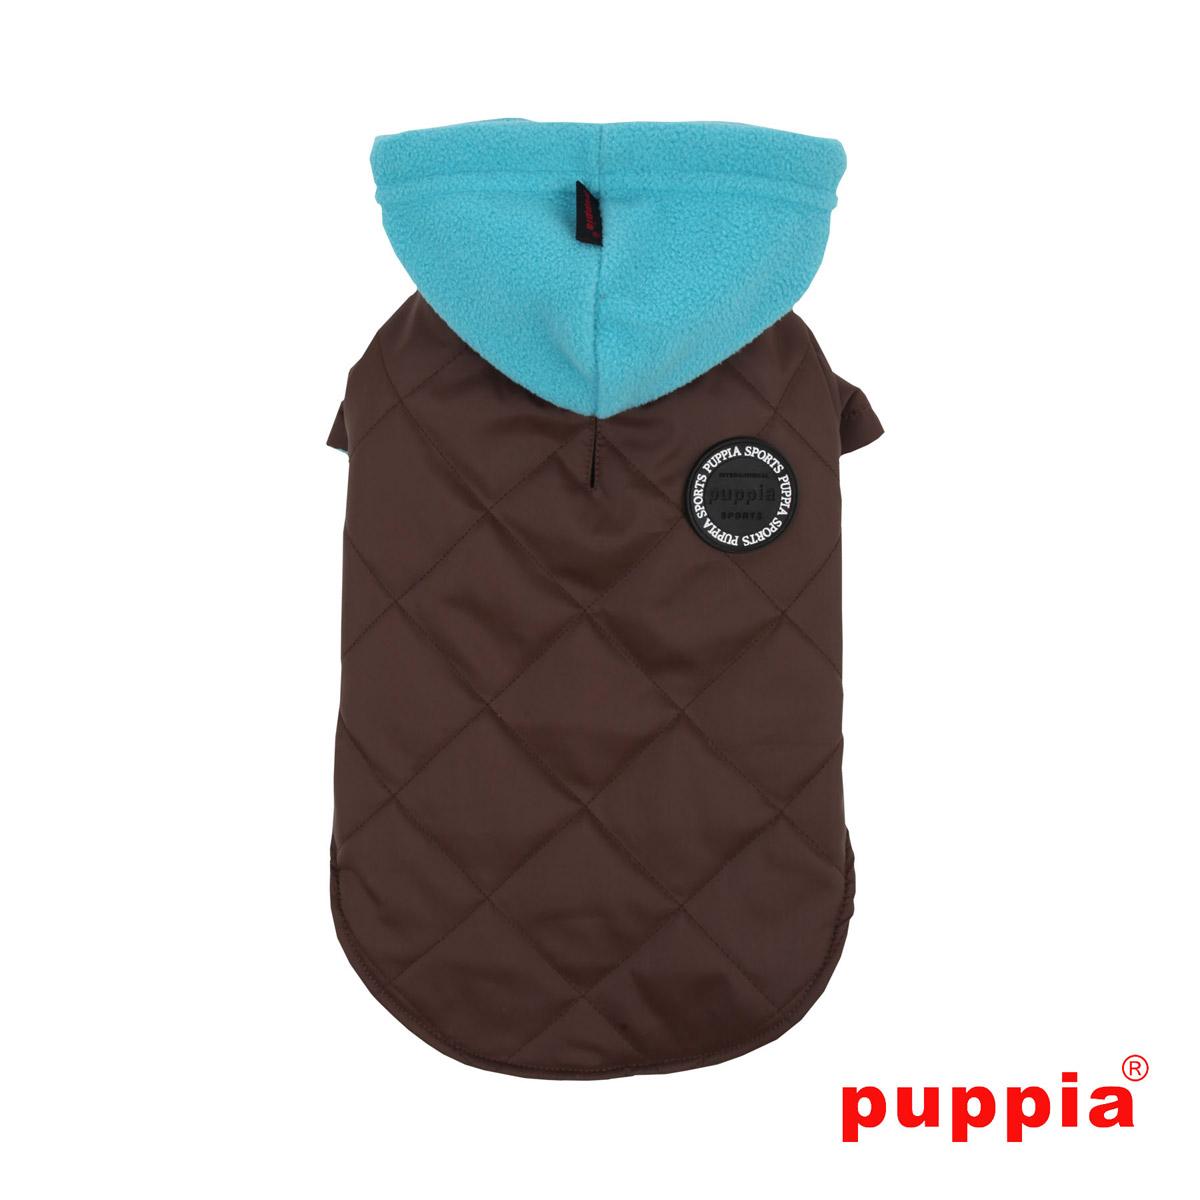 Snowcap Dog Coat by Puppia - Brown